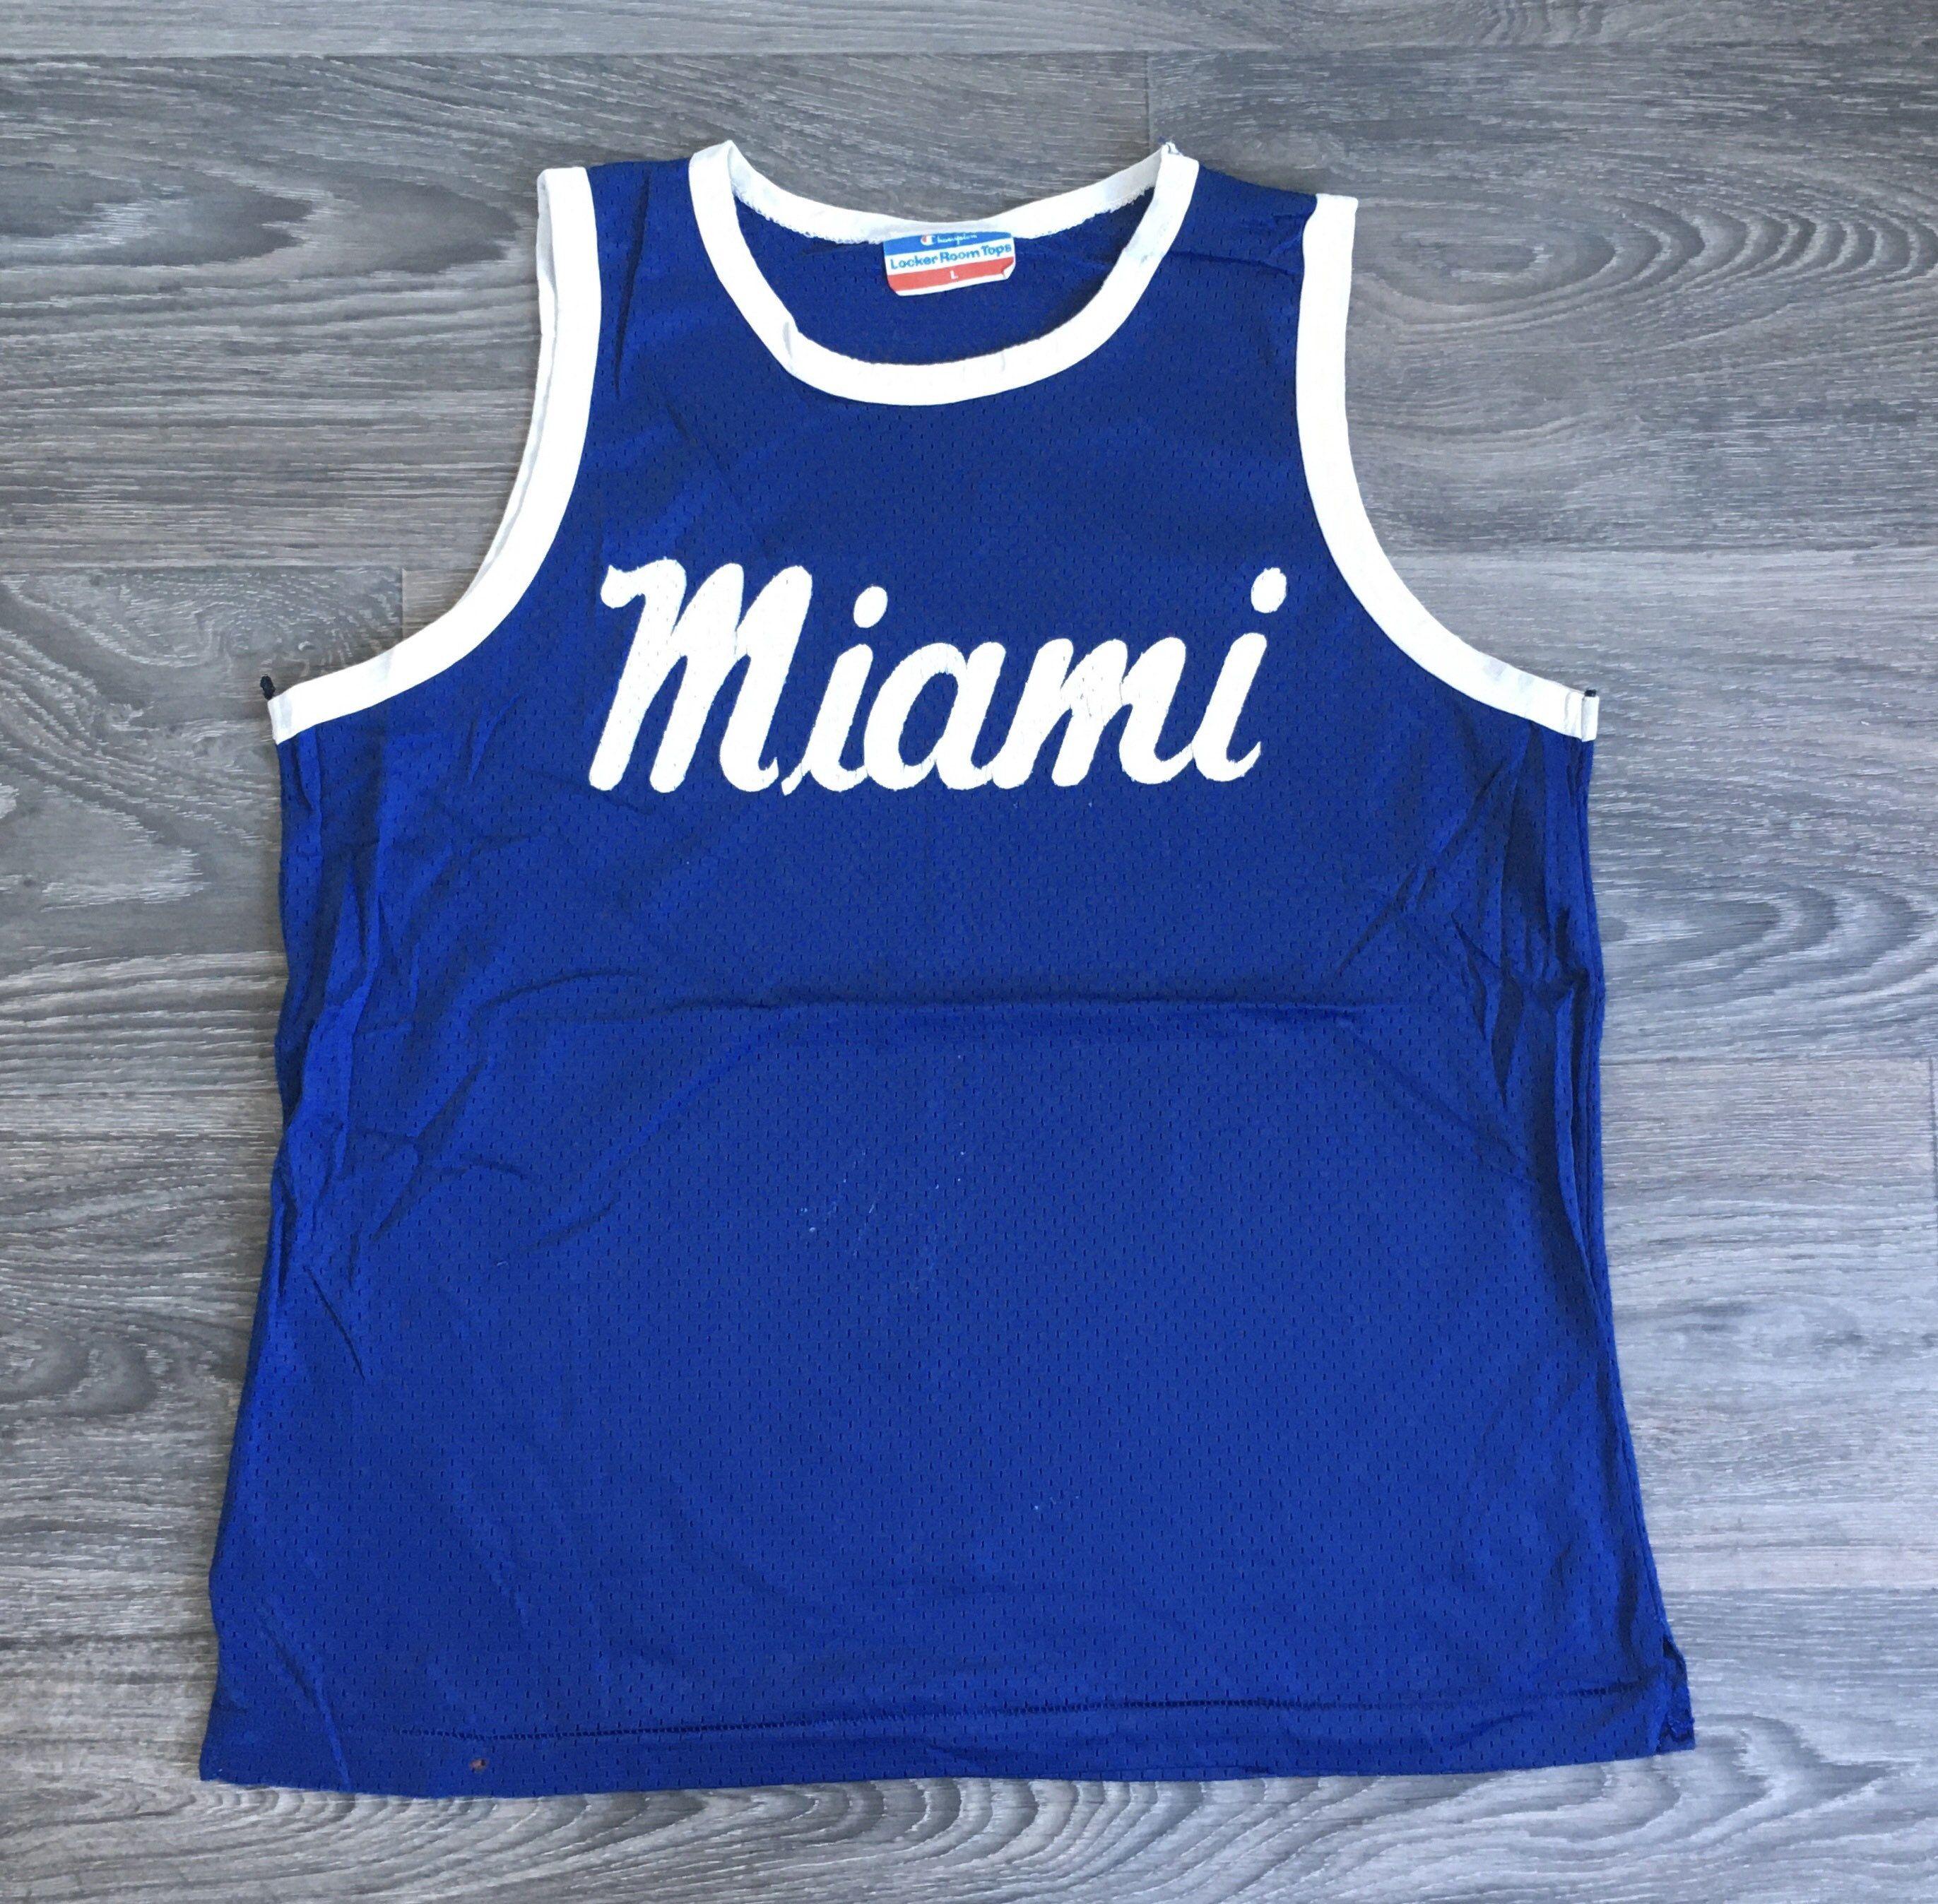 Miami Jersey 70 S Vintage Champion Locker Room Tops Etsy In 2020 Vintage Champion Muscle Tank Tops Vintage Jerseys